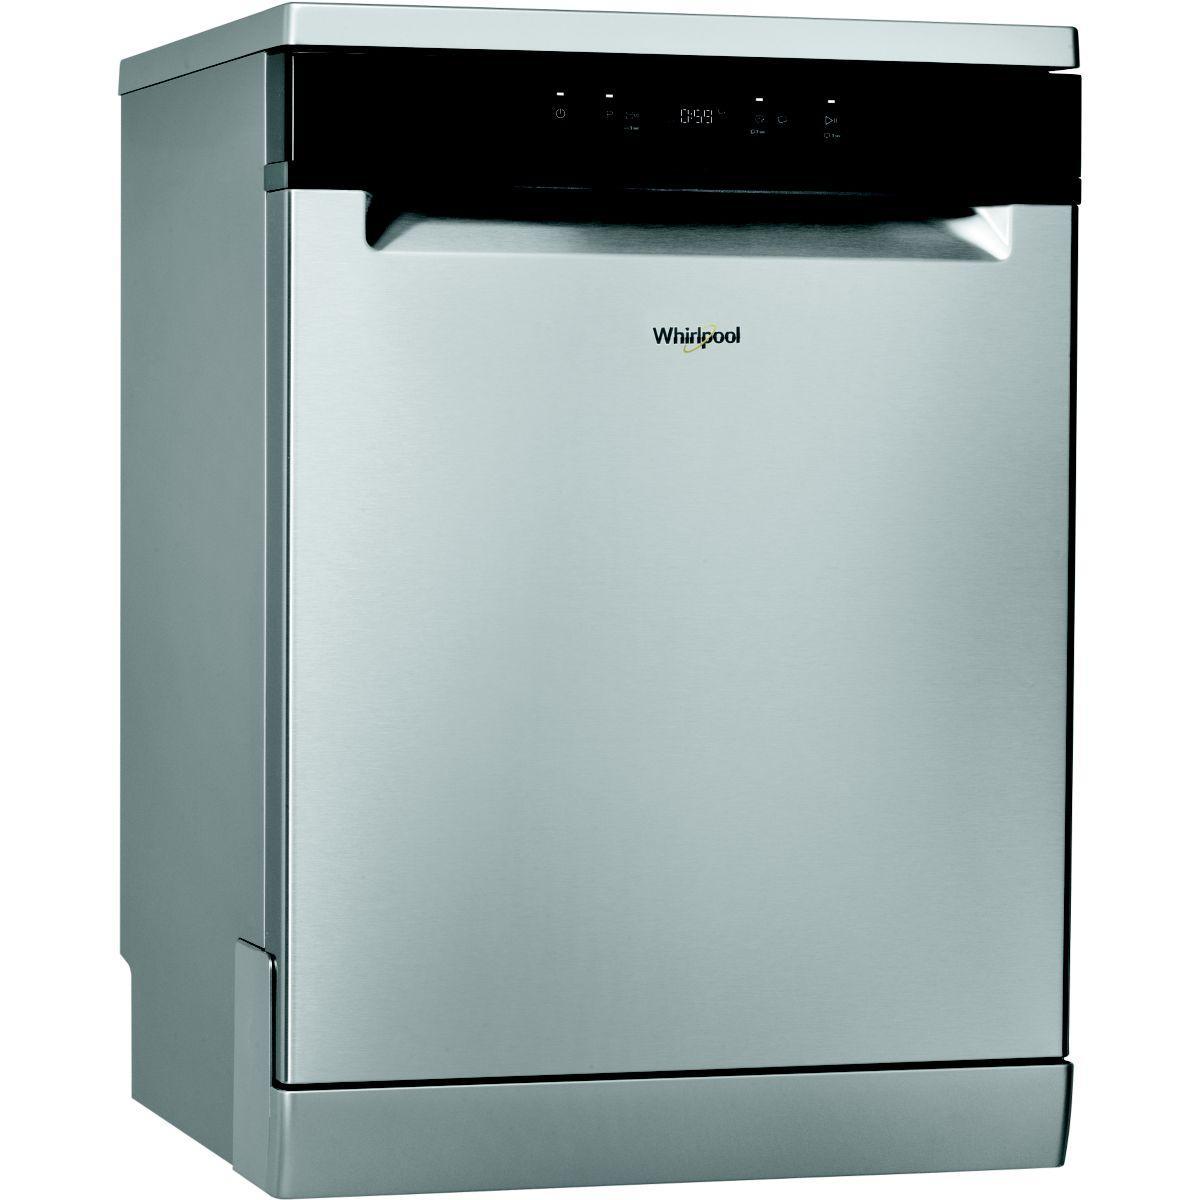 Lave vaisselle 60 cm WHIRLPOOL WFC3B16X